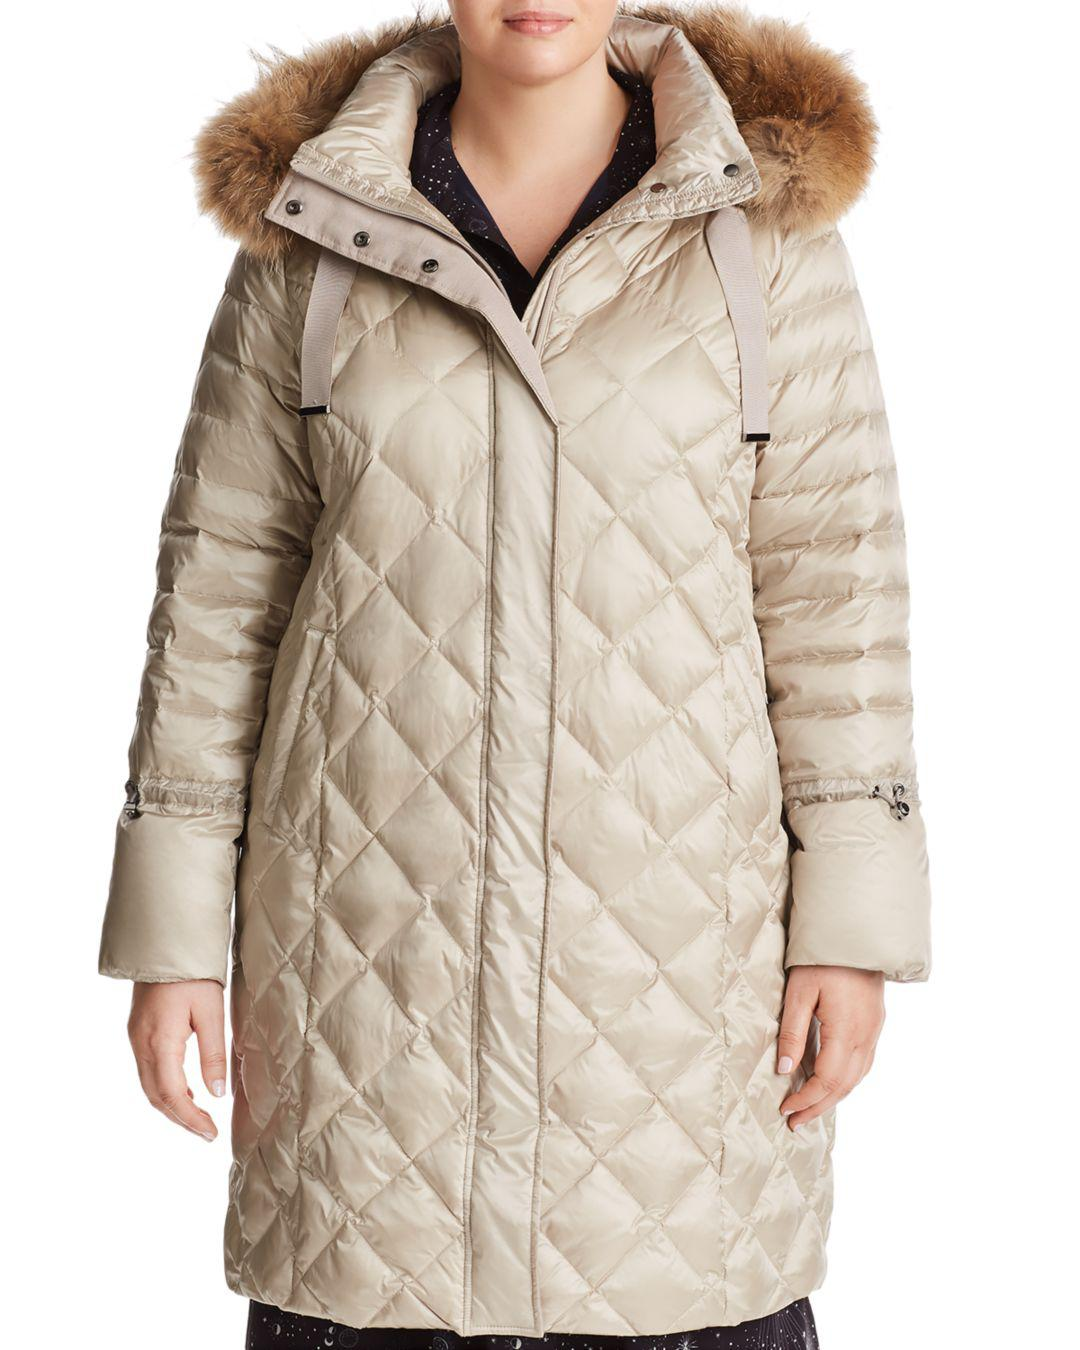 Marina Rinaldi Panacea Fur-trimmed Down Coat in Natural - Lyst 78189f895f0